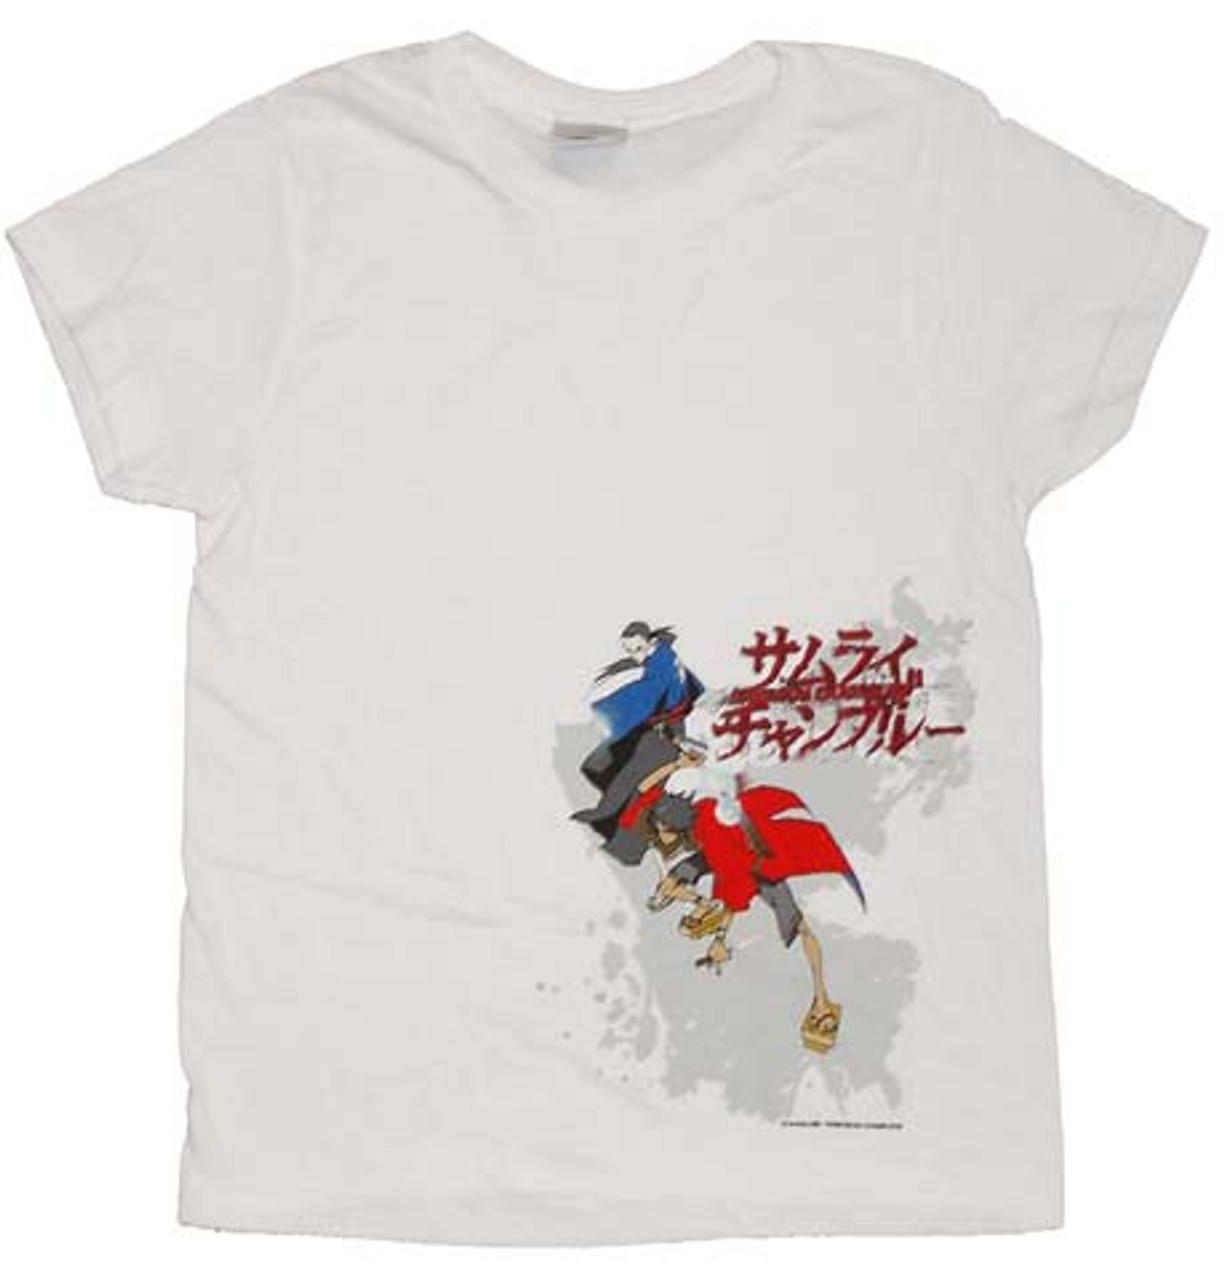 Samurai Champloo Printed Unisex T-Shirts 100/% Cotton A